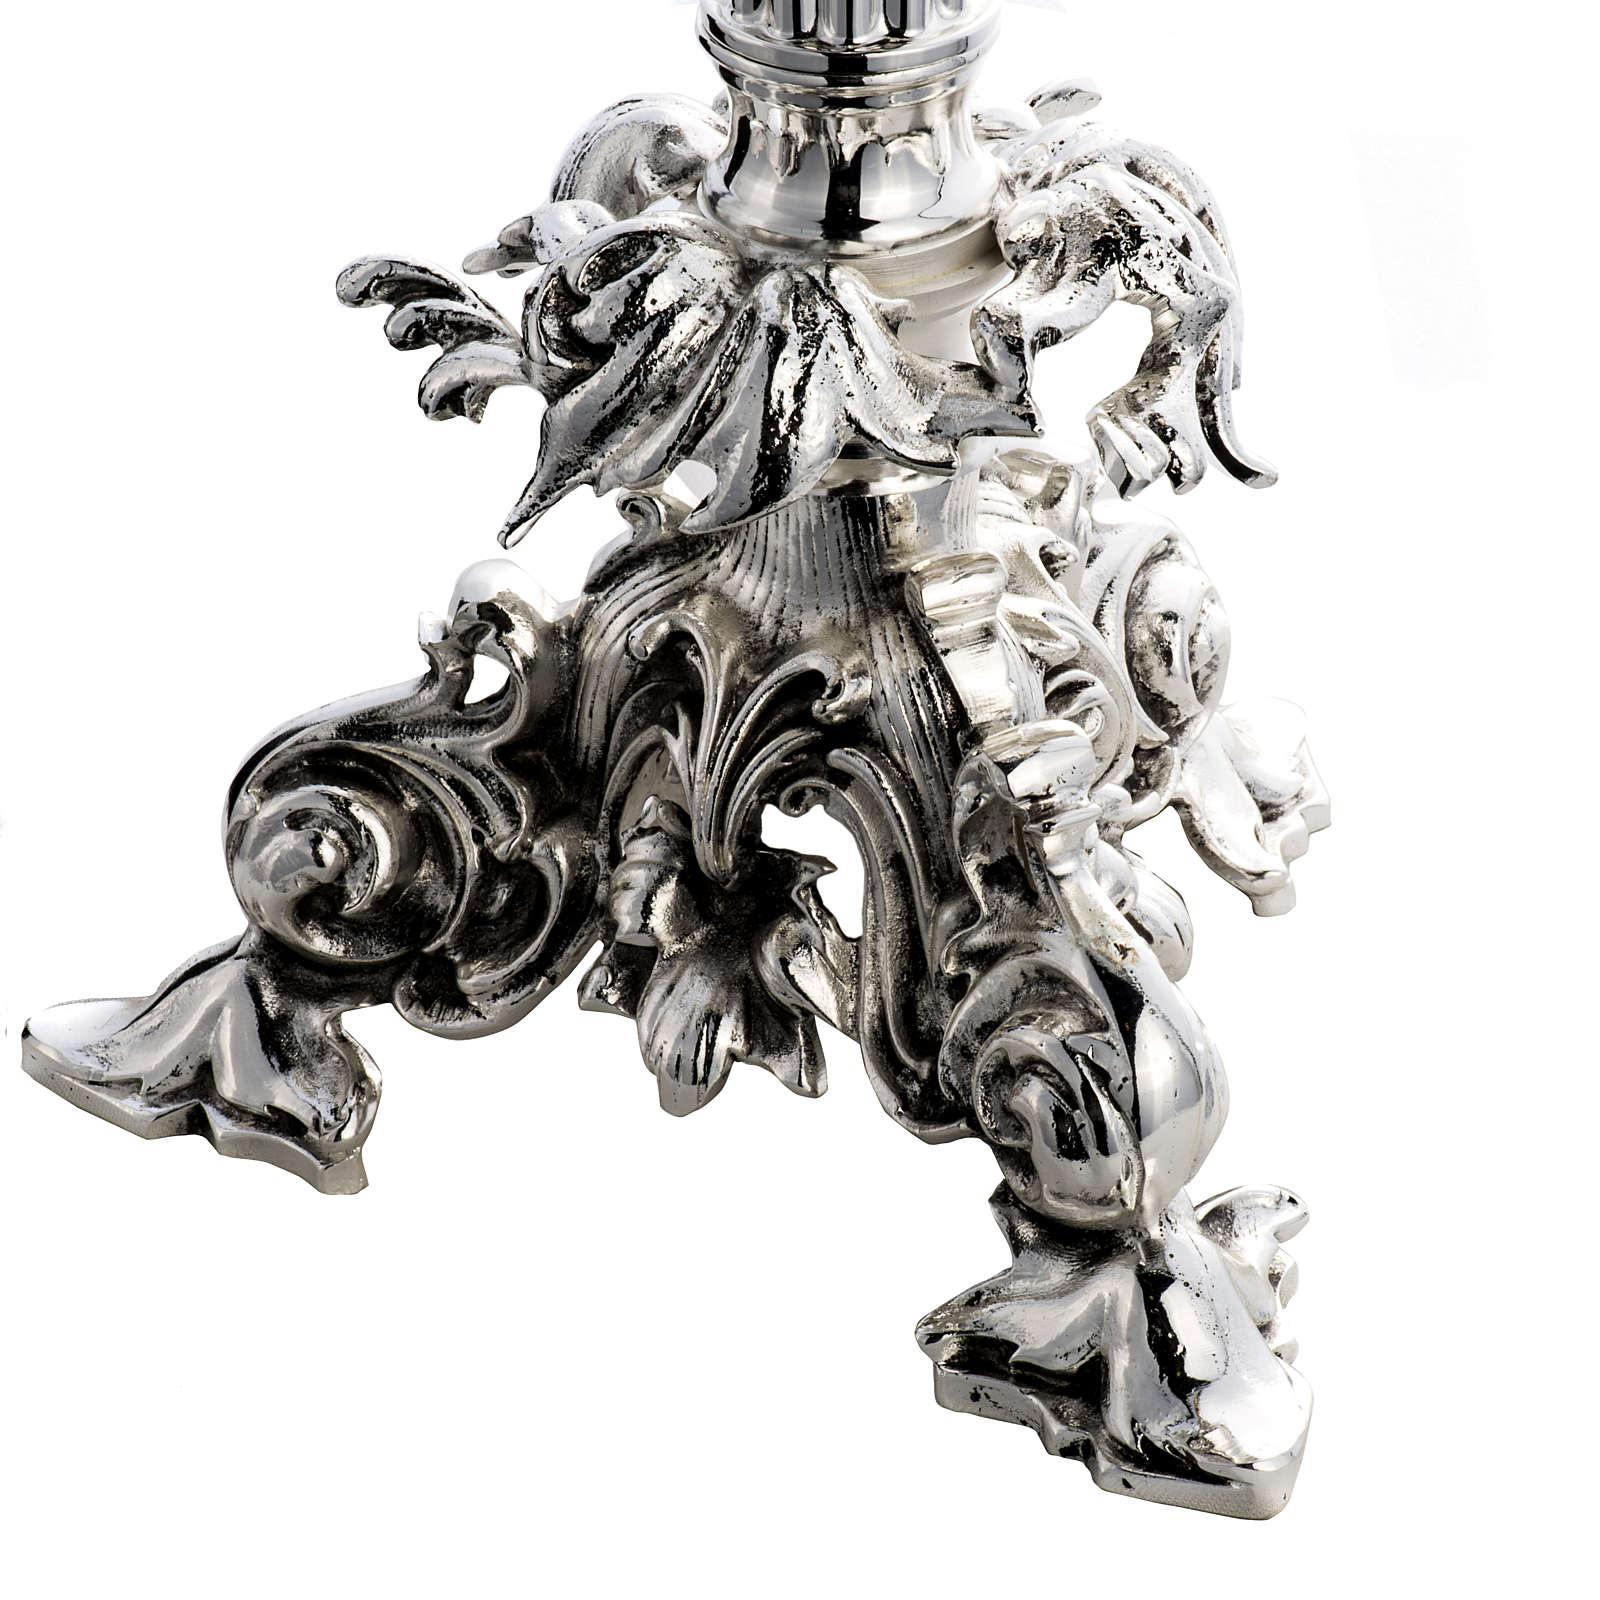 Custodia barroco hostia magna ángeles latón plateado 4